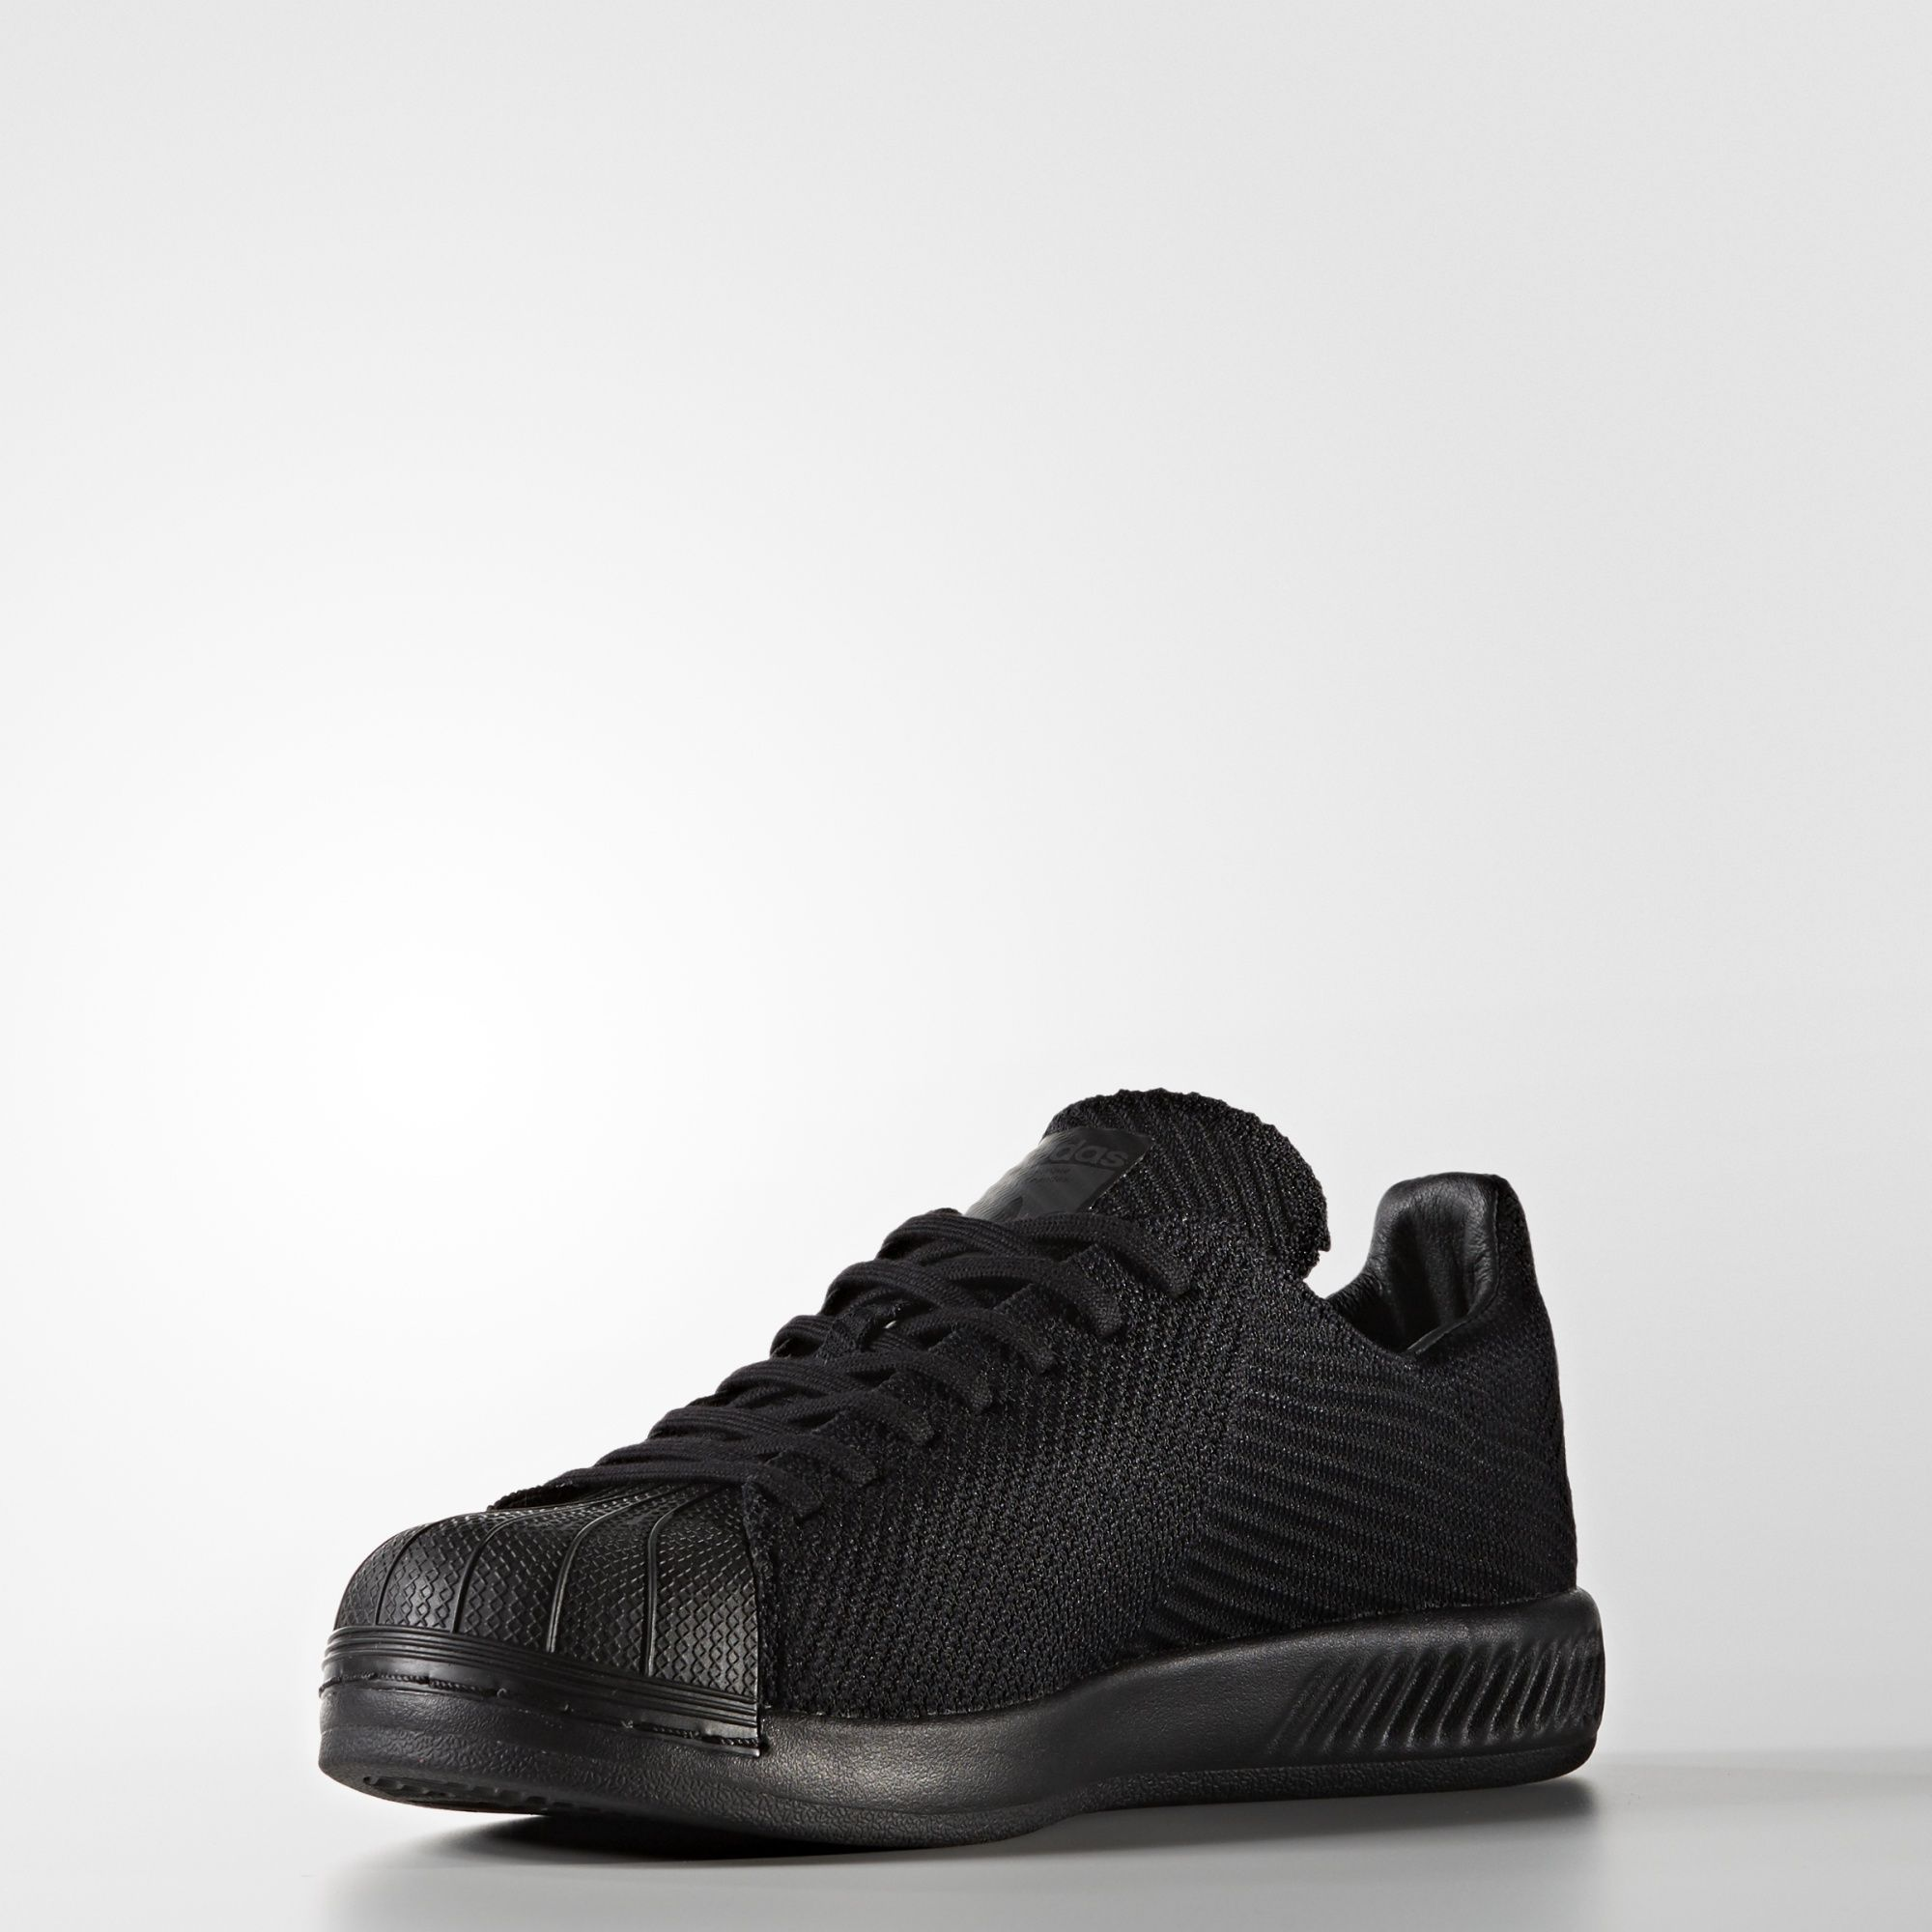 73357f44b80ea adidas - Superstar Primeknit Shoes   Interesting Pins   Adidas ...